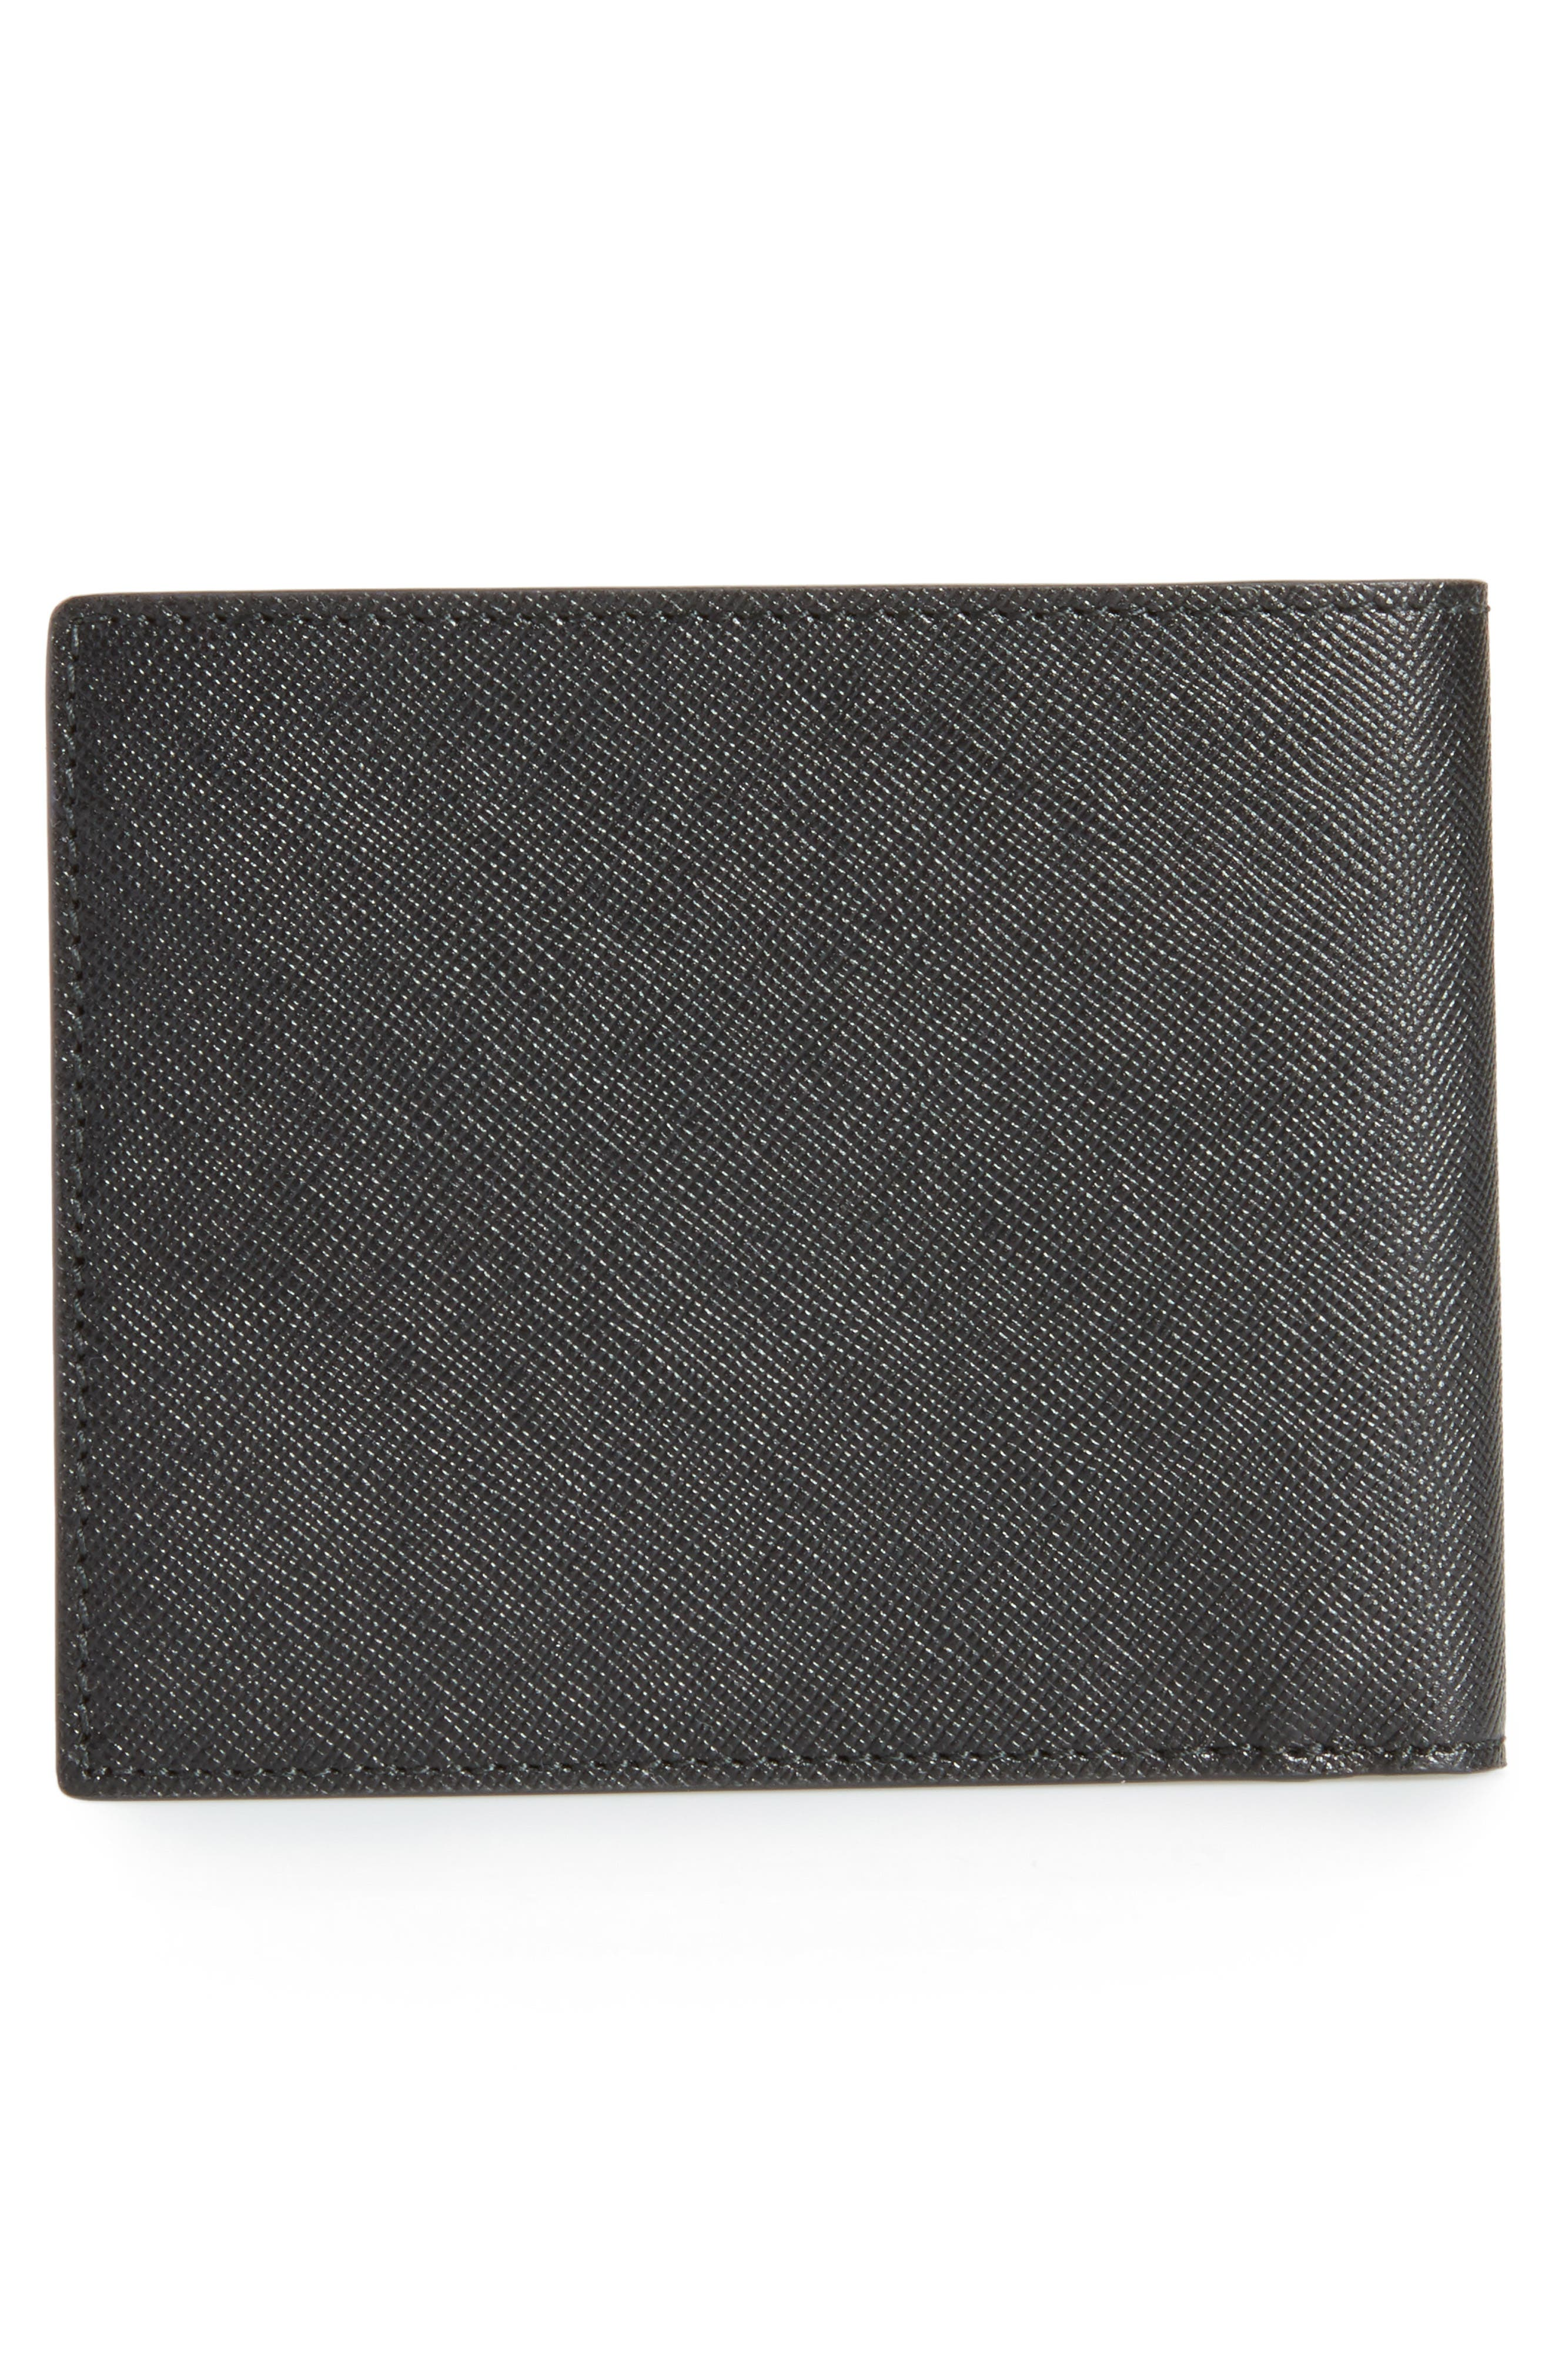 Sartorial Leather Wallet,                             Alternate thumbnail 3, color,                             BLACK